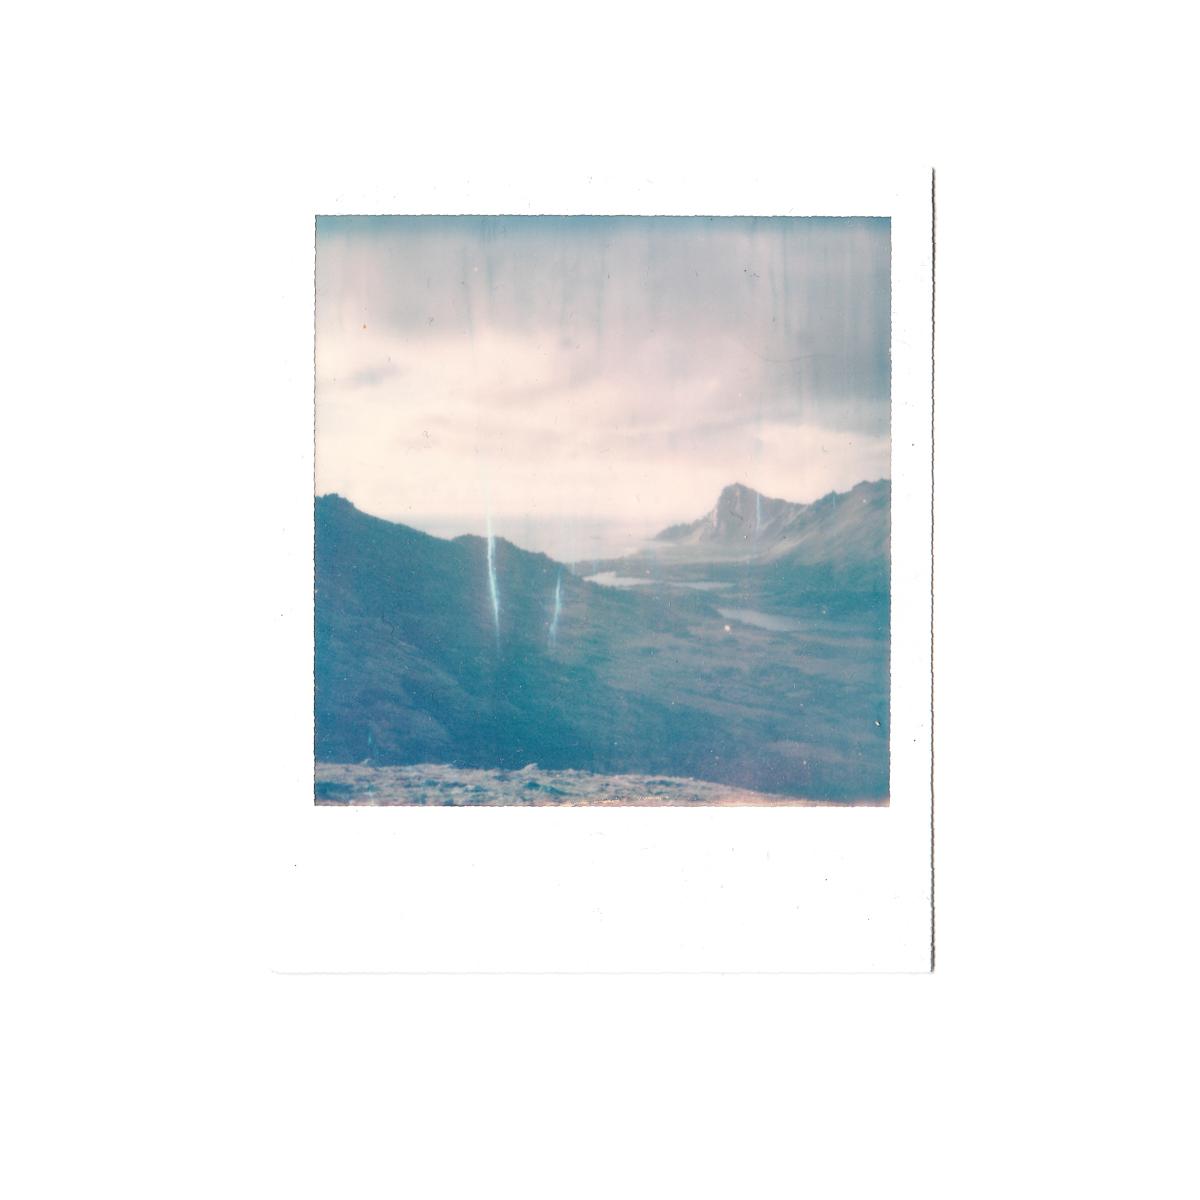 Magnolia_mountain_solvor_MT34-18.jpg